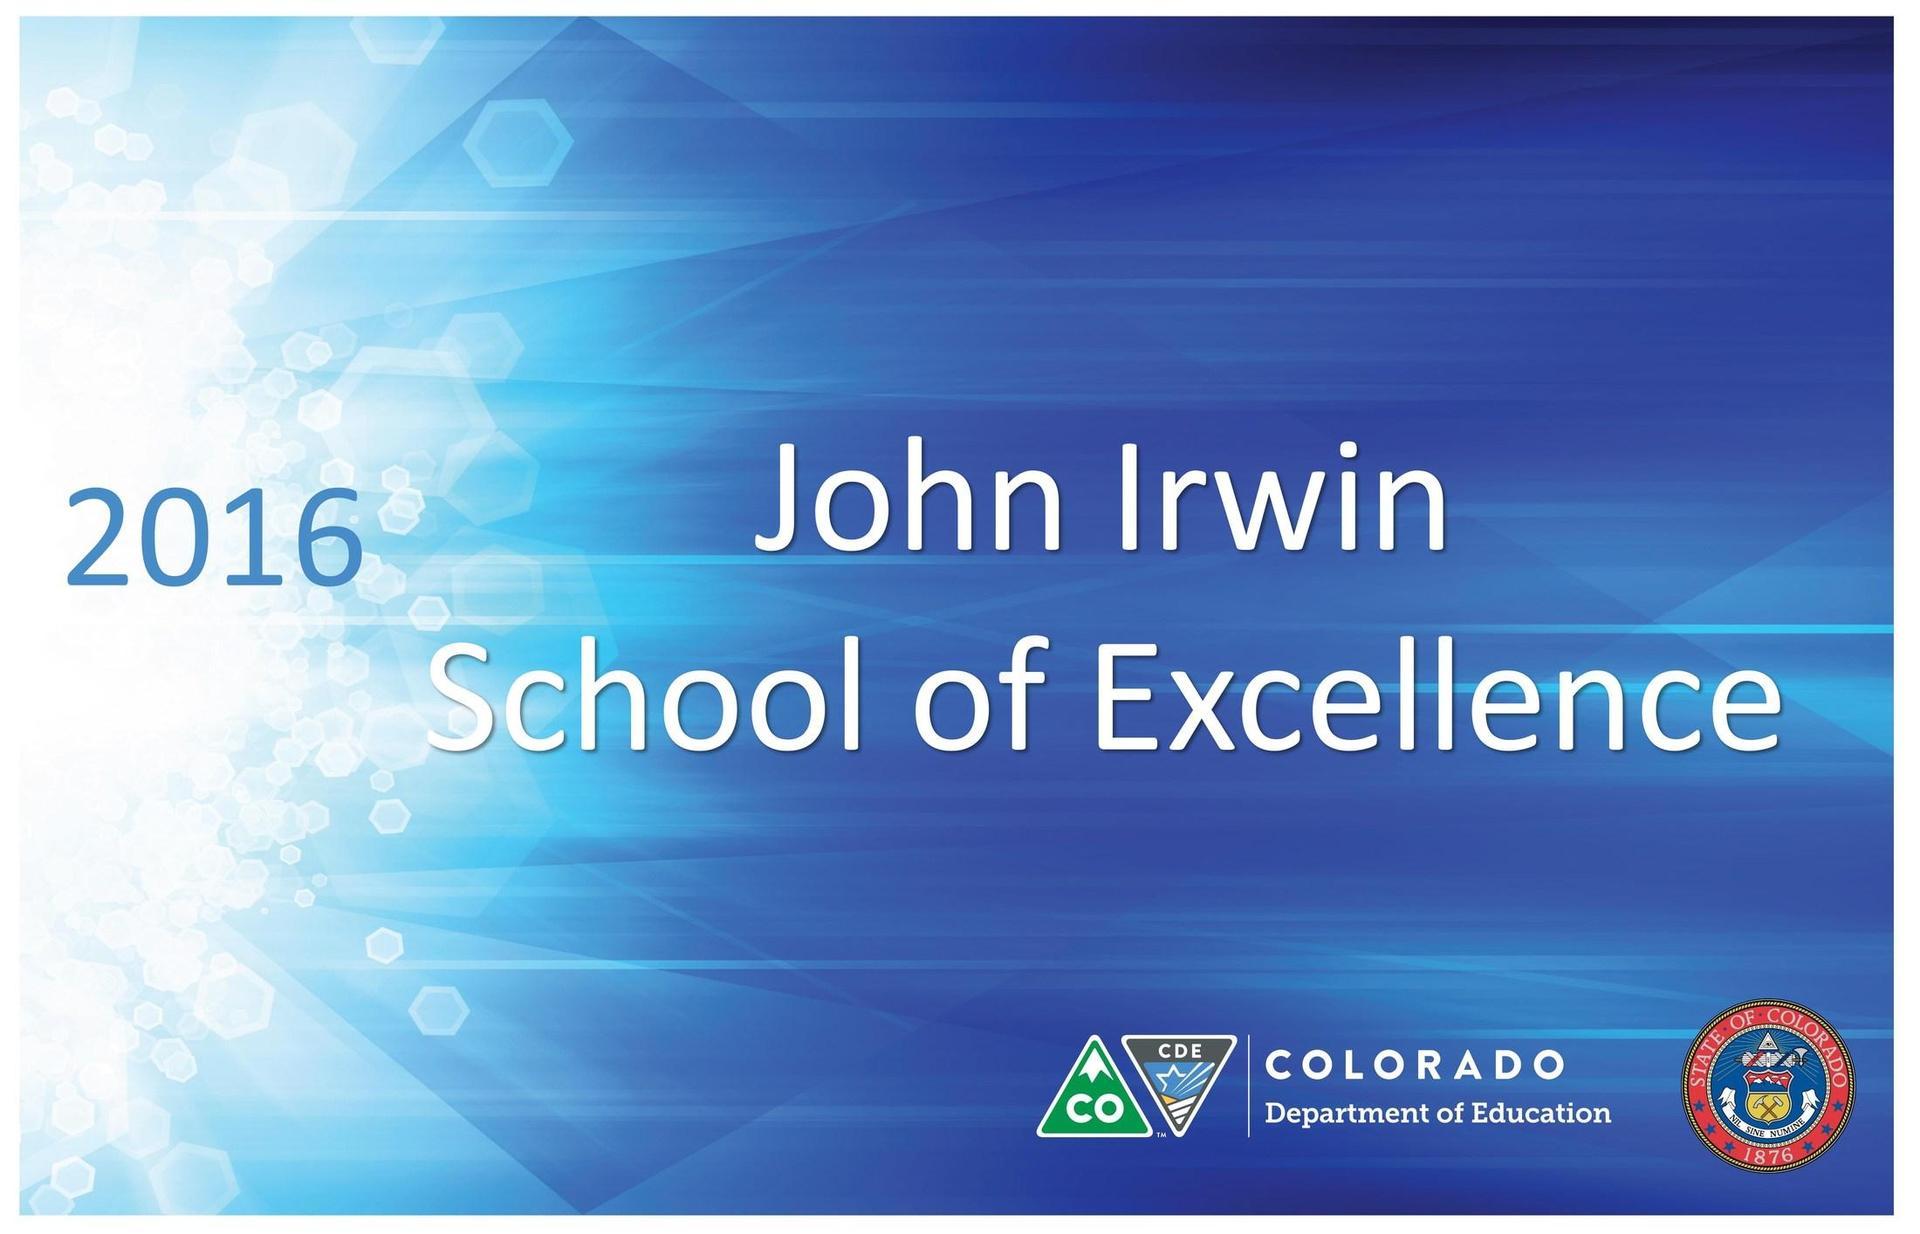 John Irwin School of Excellence Award 2016